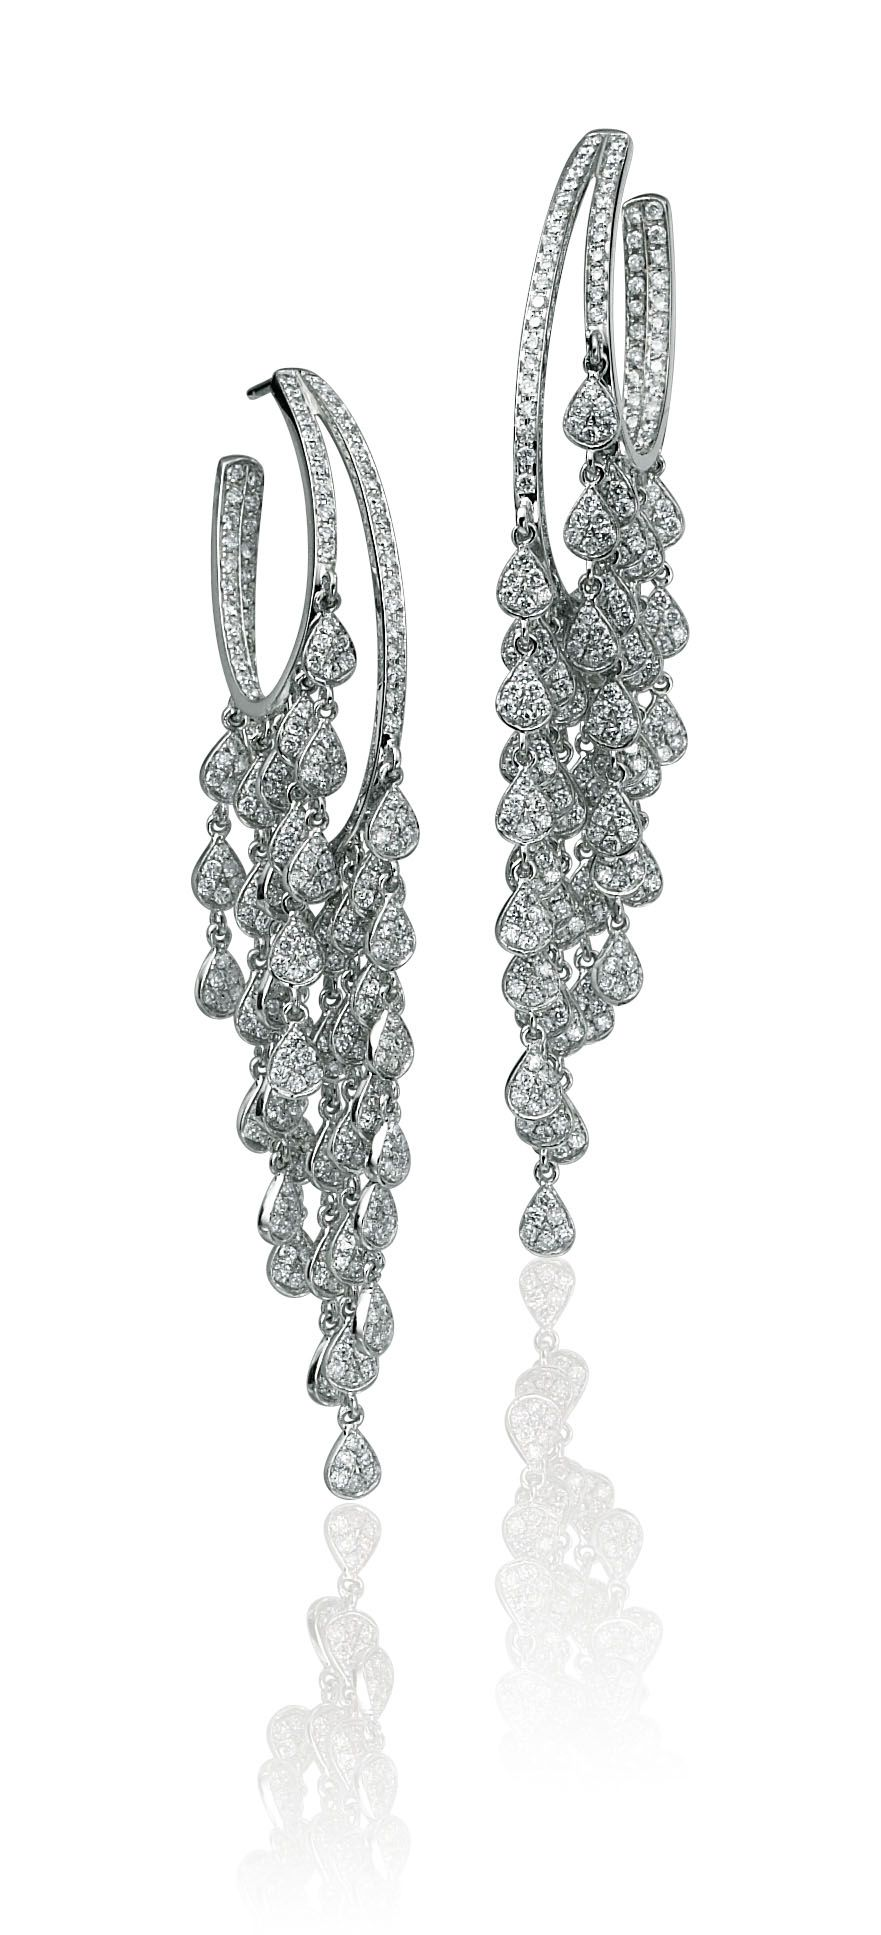 Diamond Tear Pave Drop Earrings From Razny Jewelers Custom Diamond Jewelry Jewels Jewelry Design